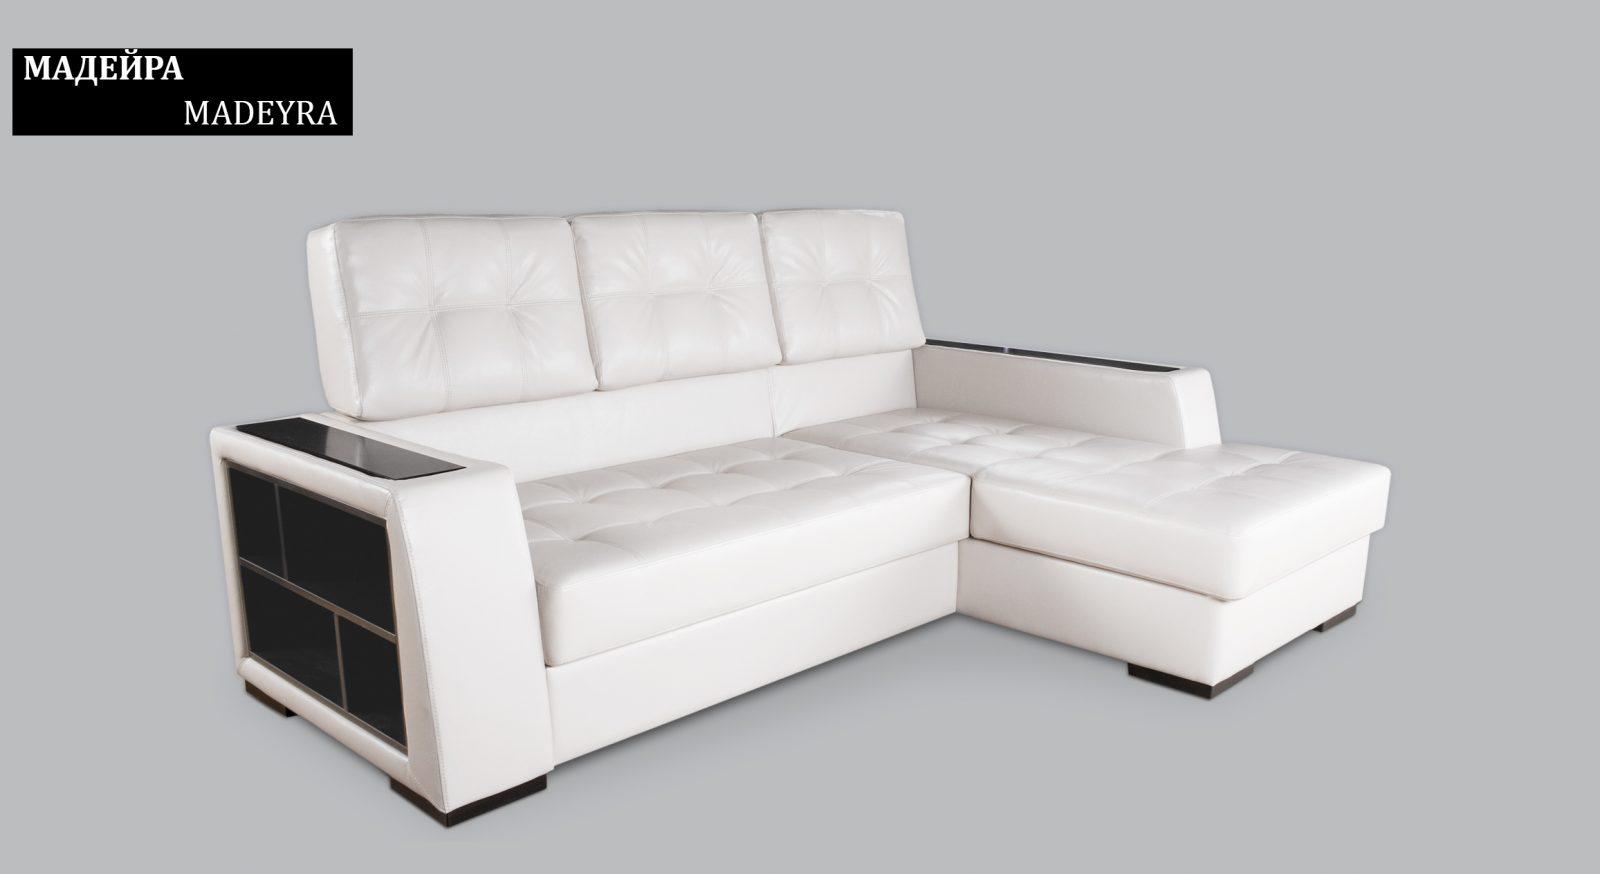 "(Български) Ъглов диван ""Мадейра"" –  Луксозни дивани Руди-Ан"